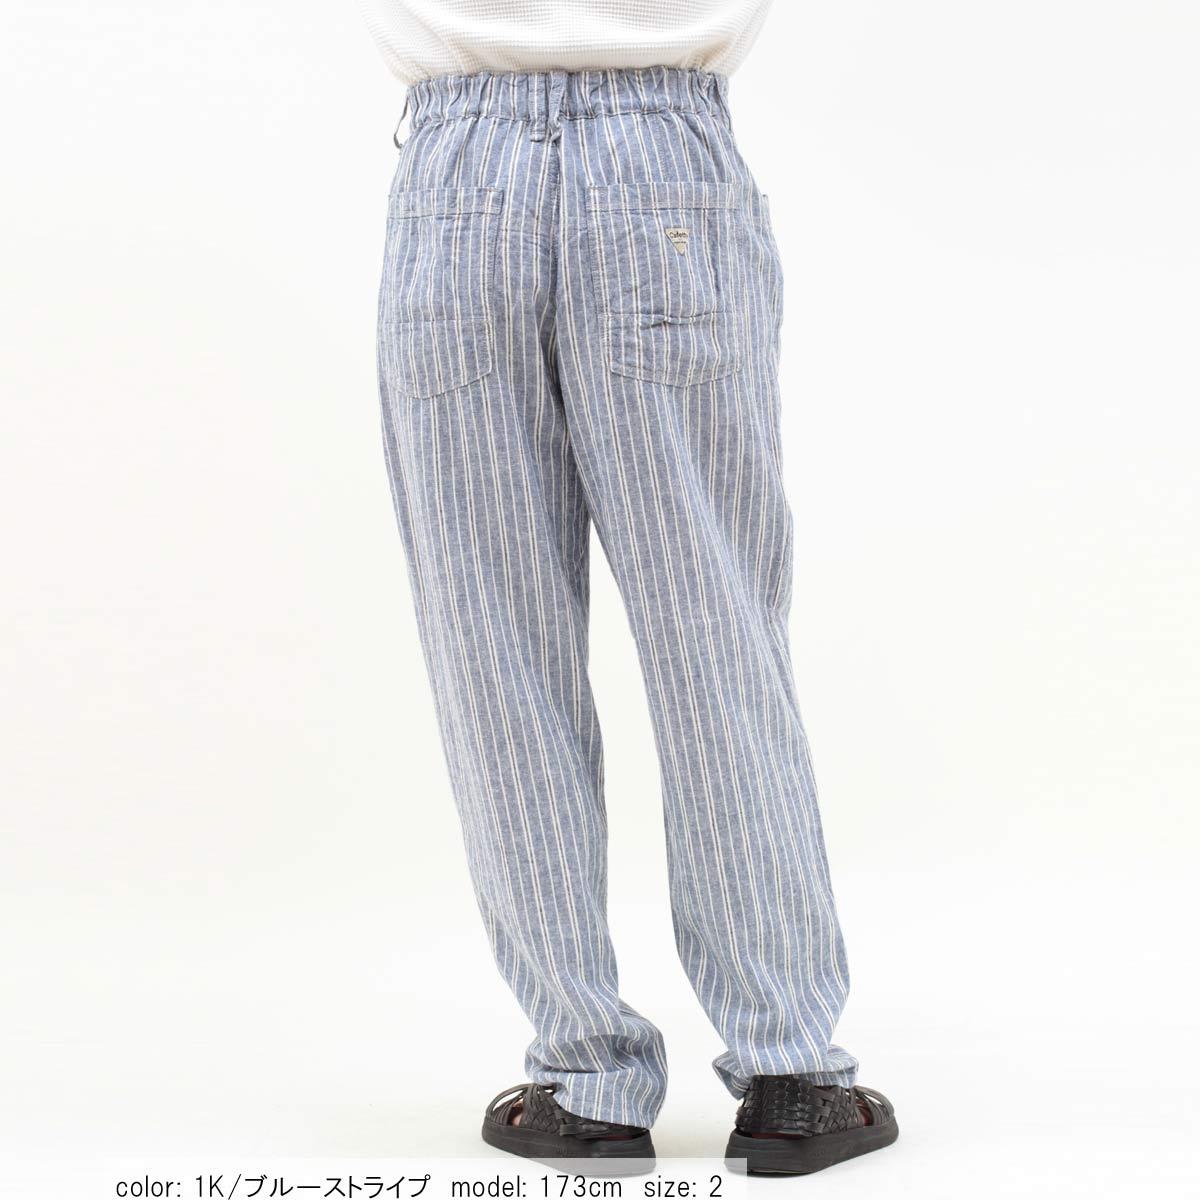 【PRE SALE】Cafetty men's リラックステーパード CFM399